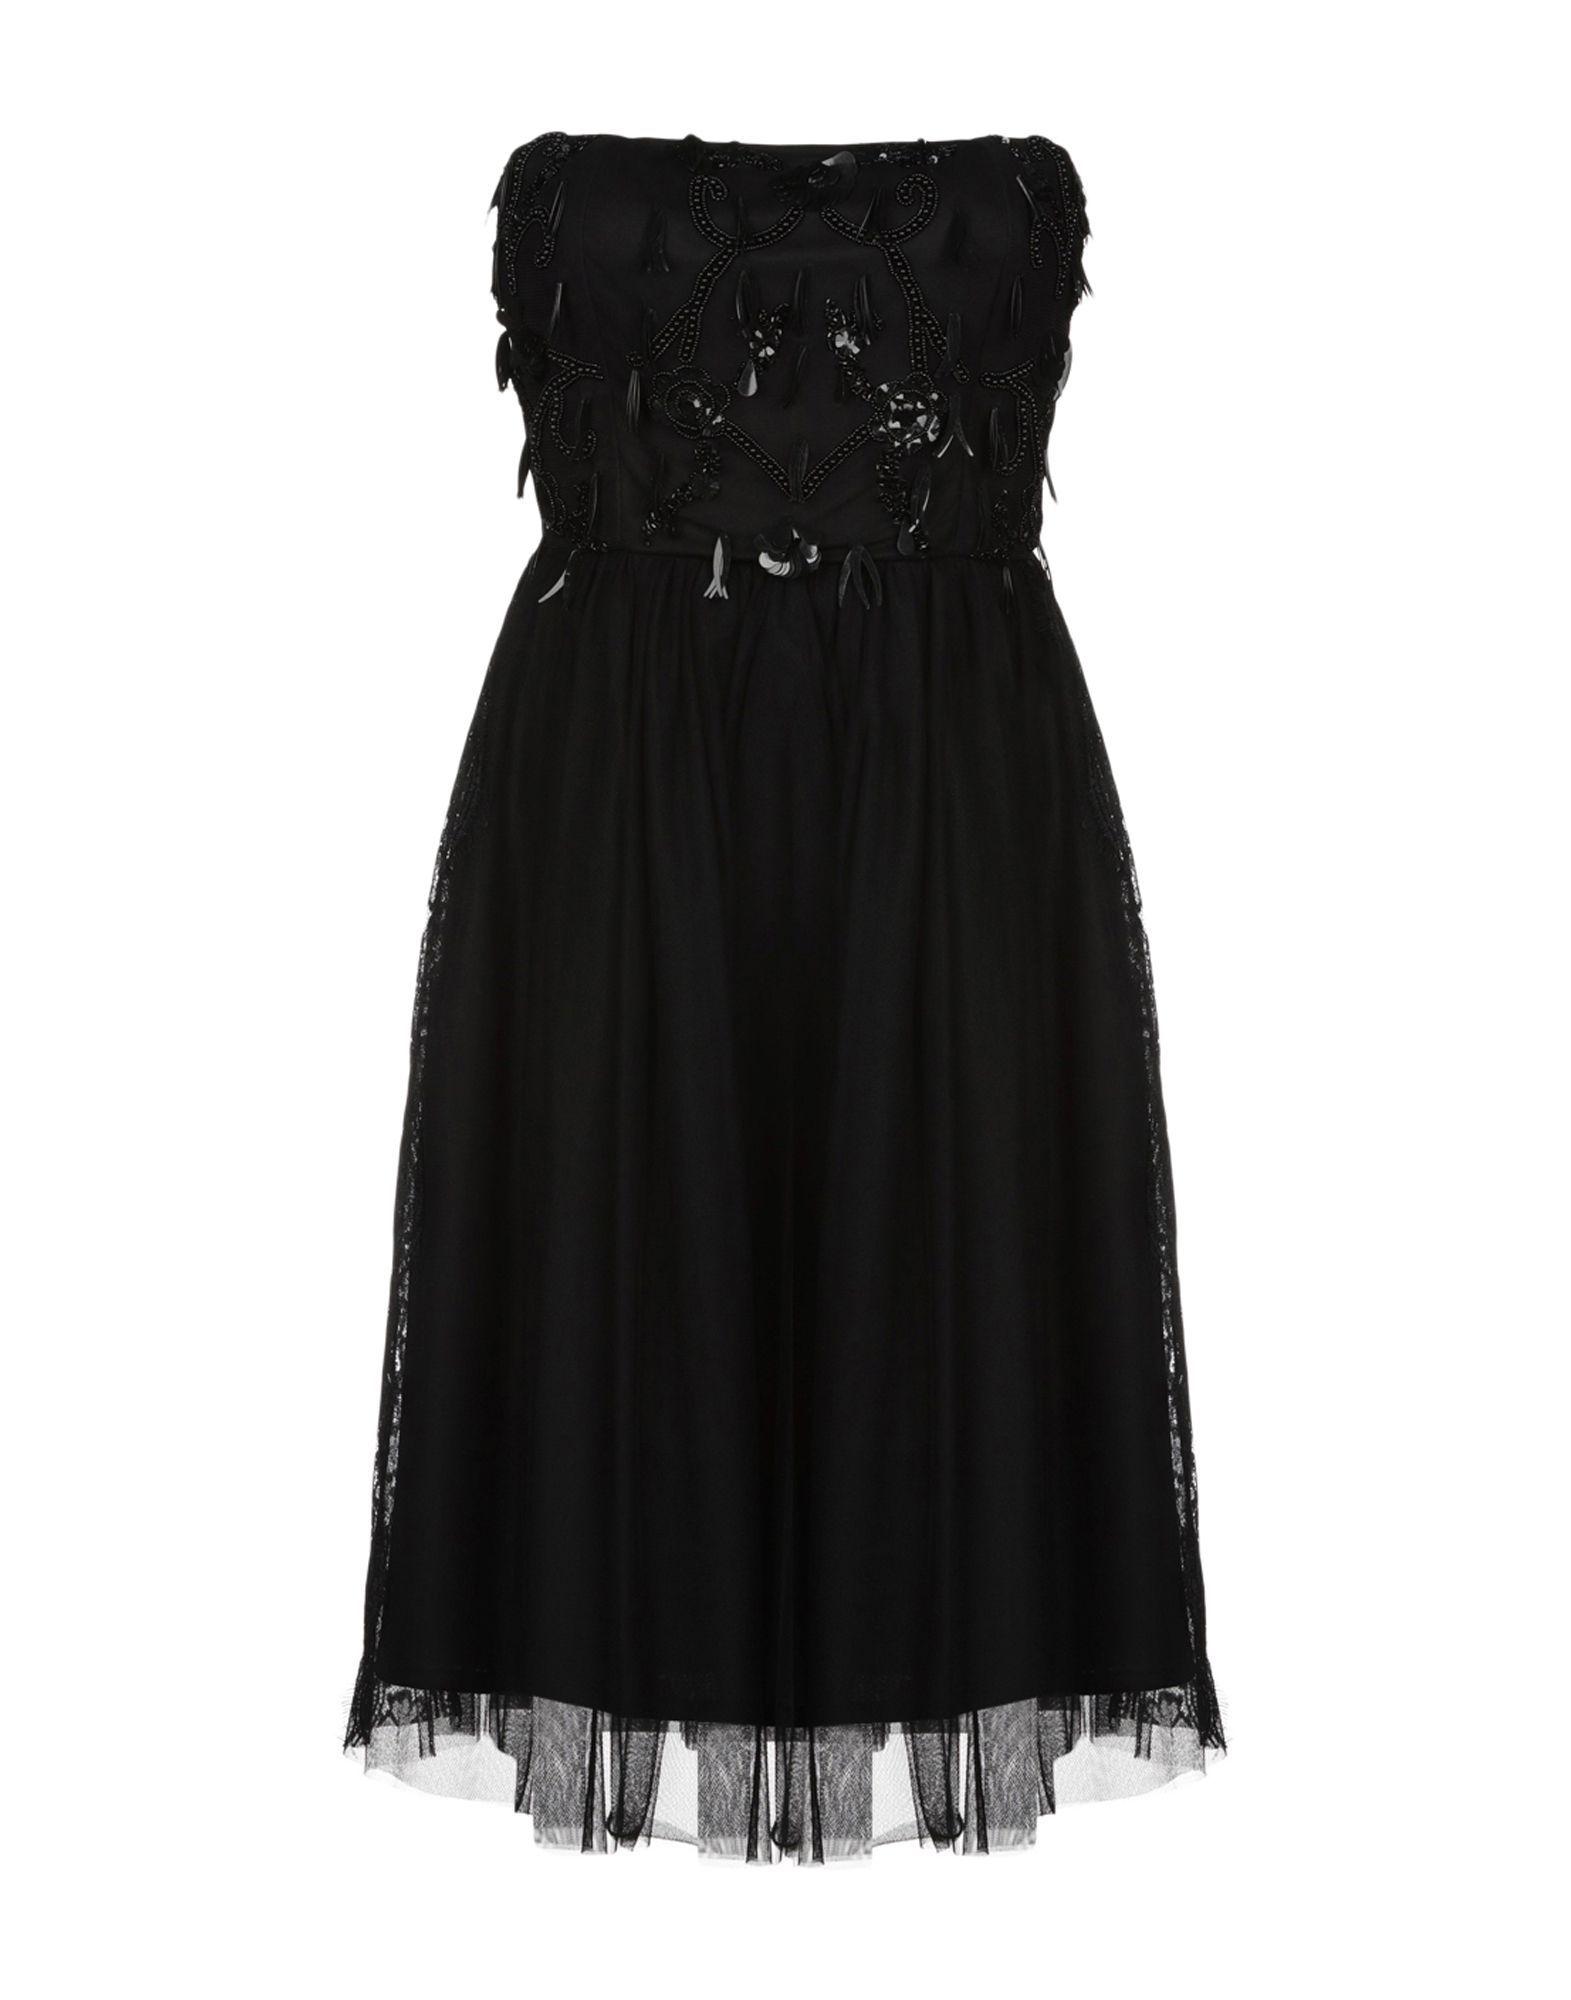 La Kore Black Tulle Strapless Dress